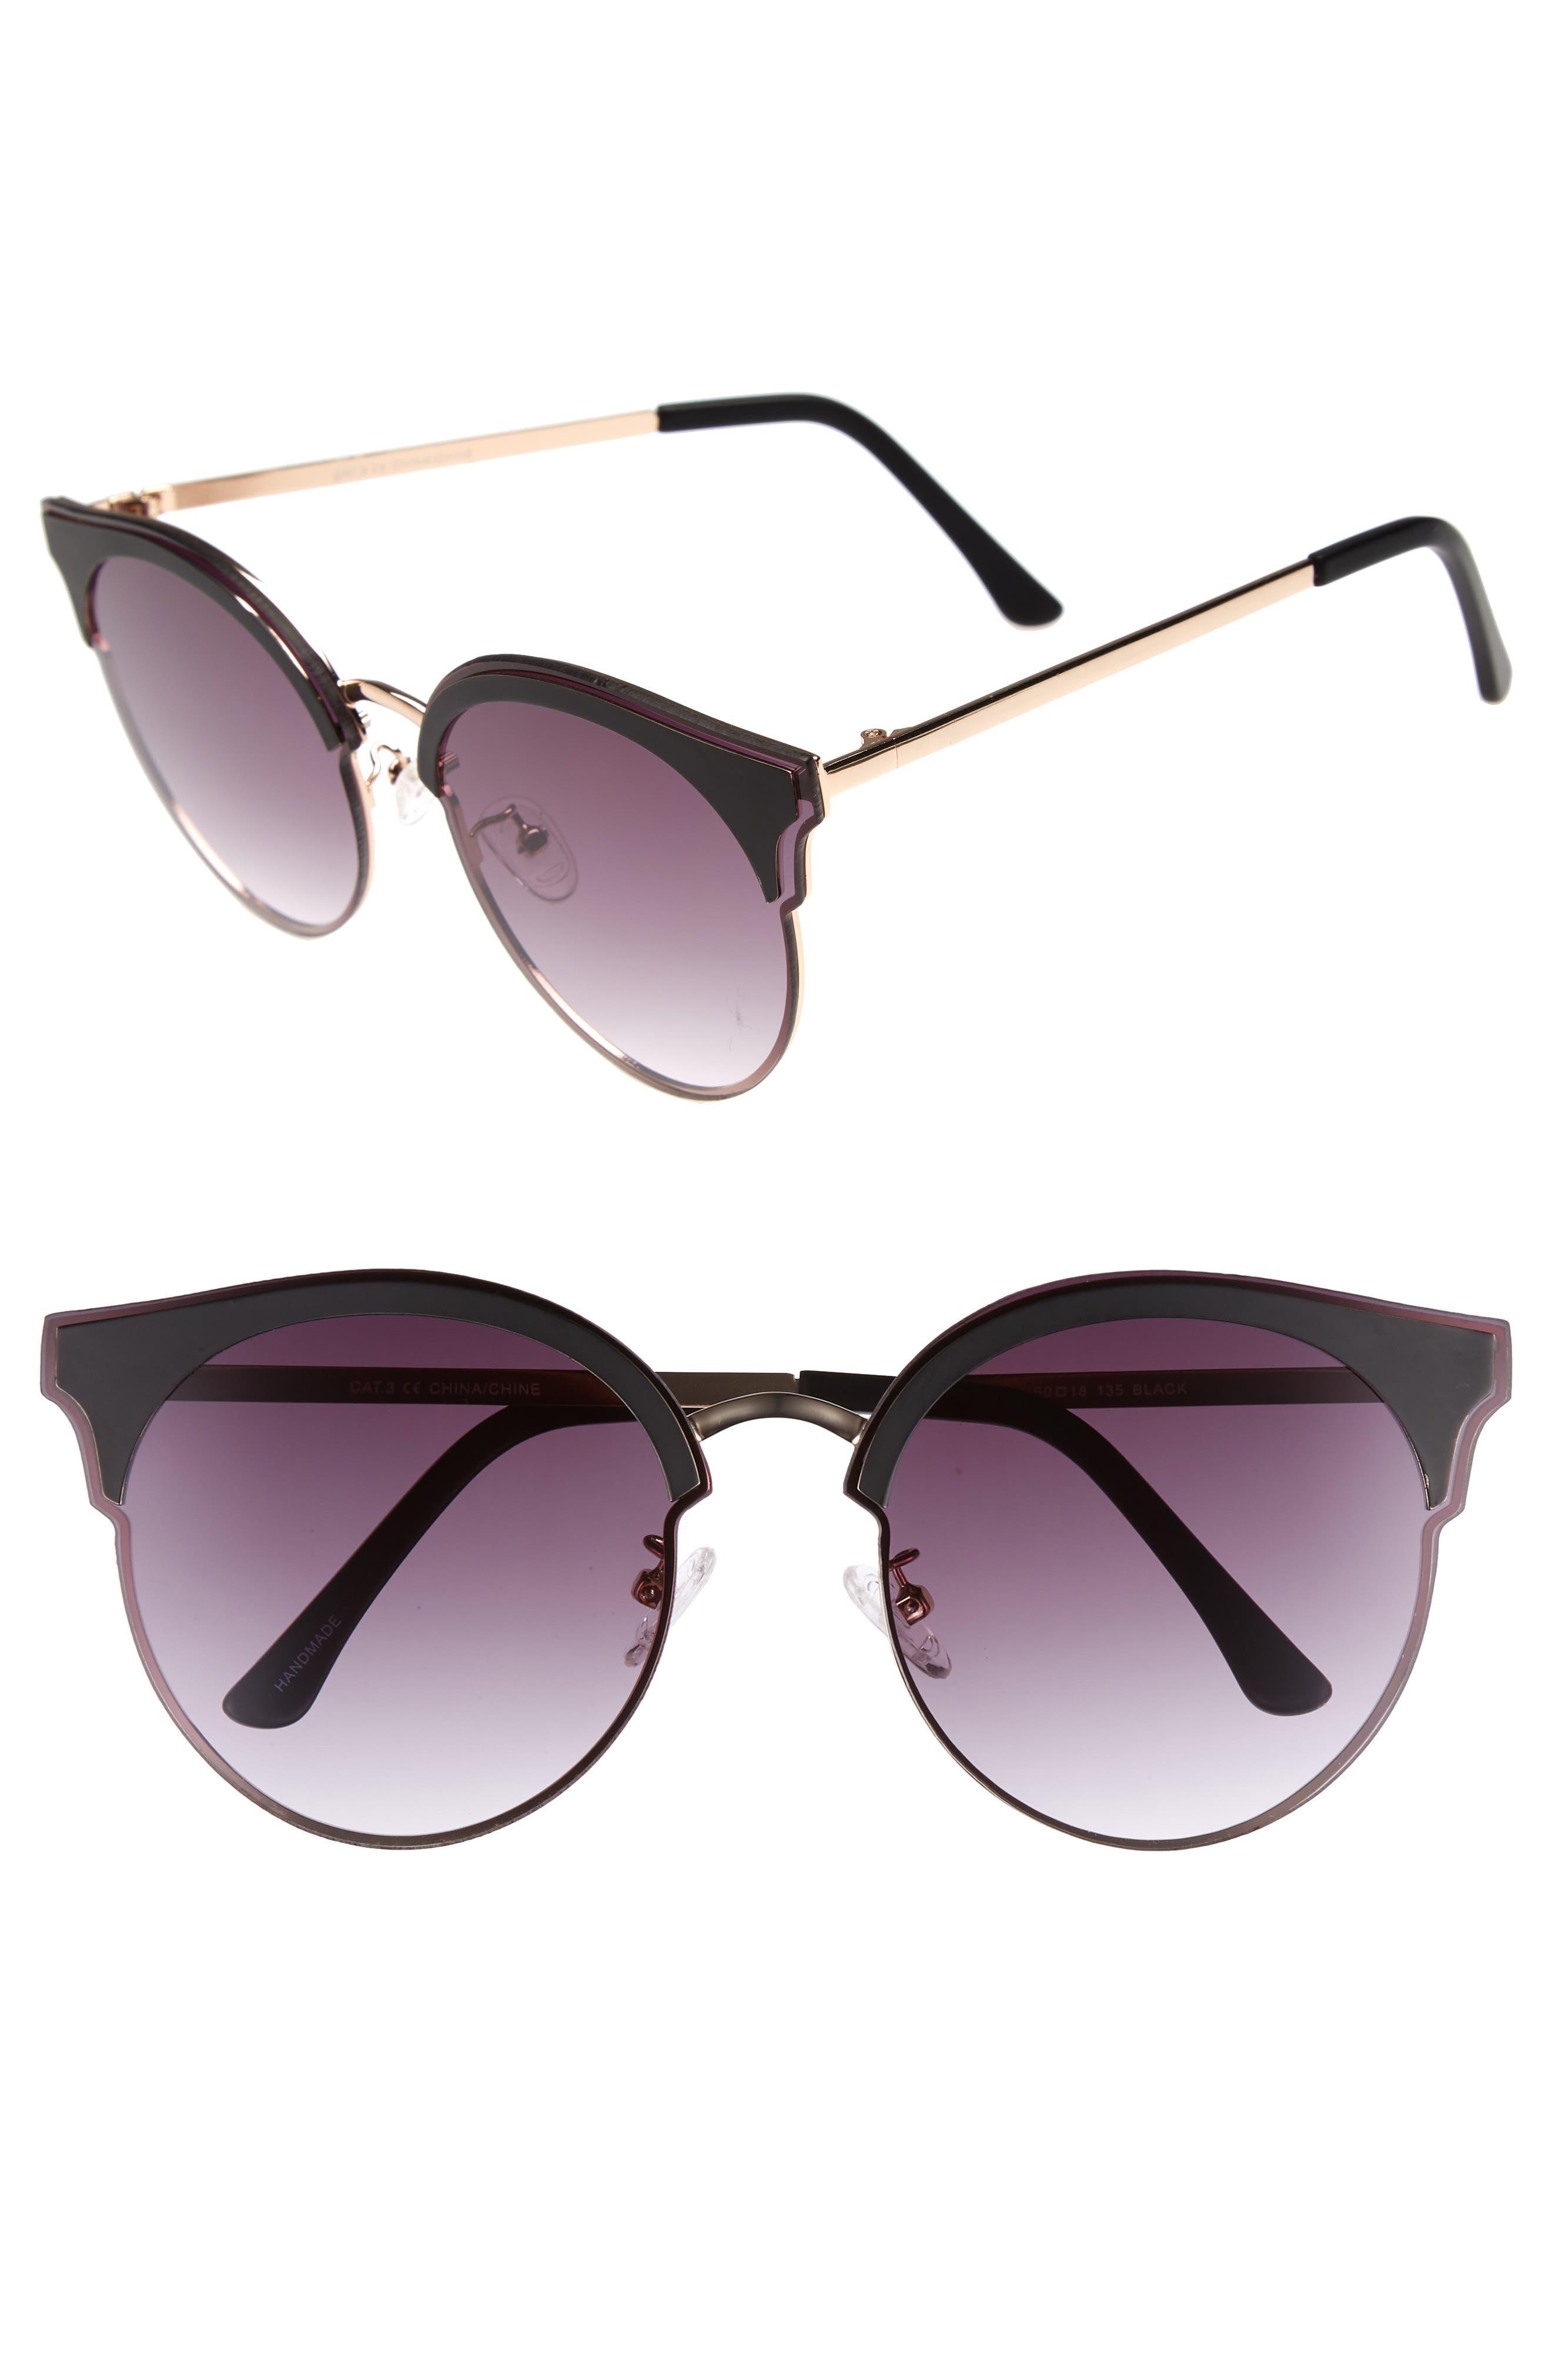 Mia 60mm Sunglasses,                             Main thumbnail 1, color,                             001